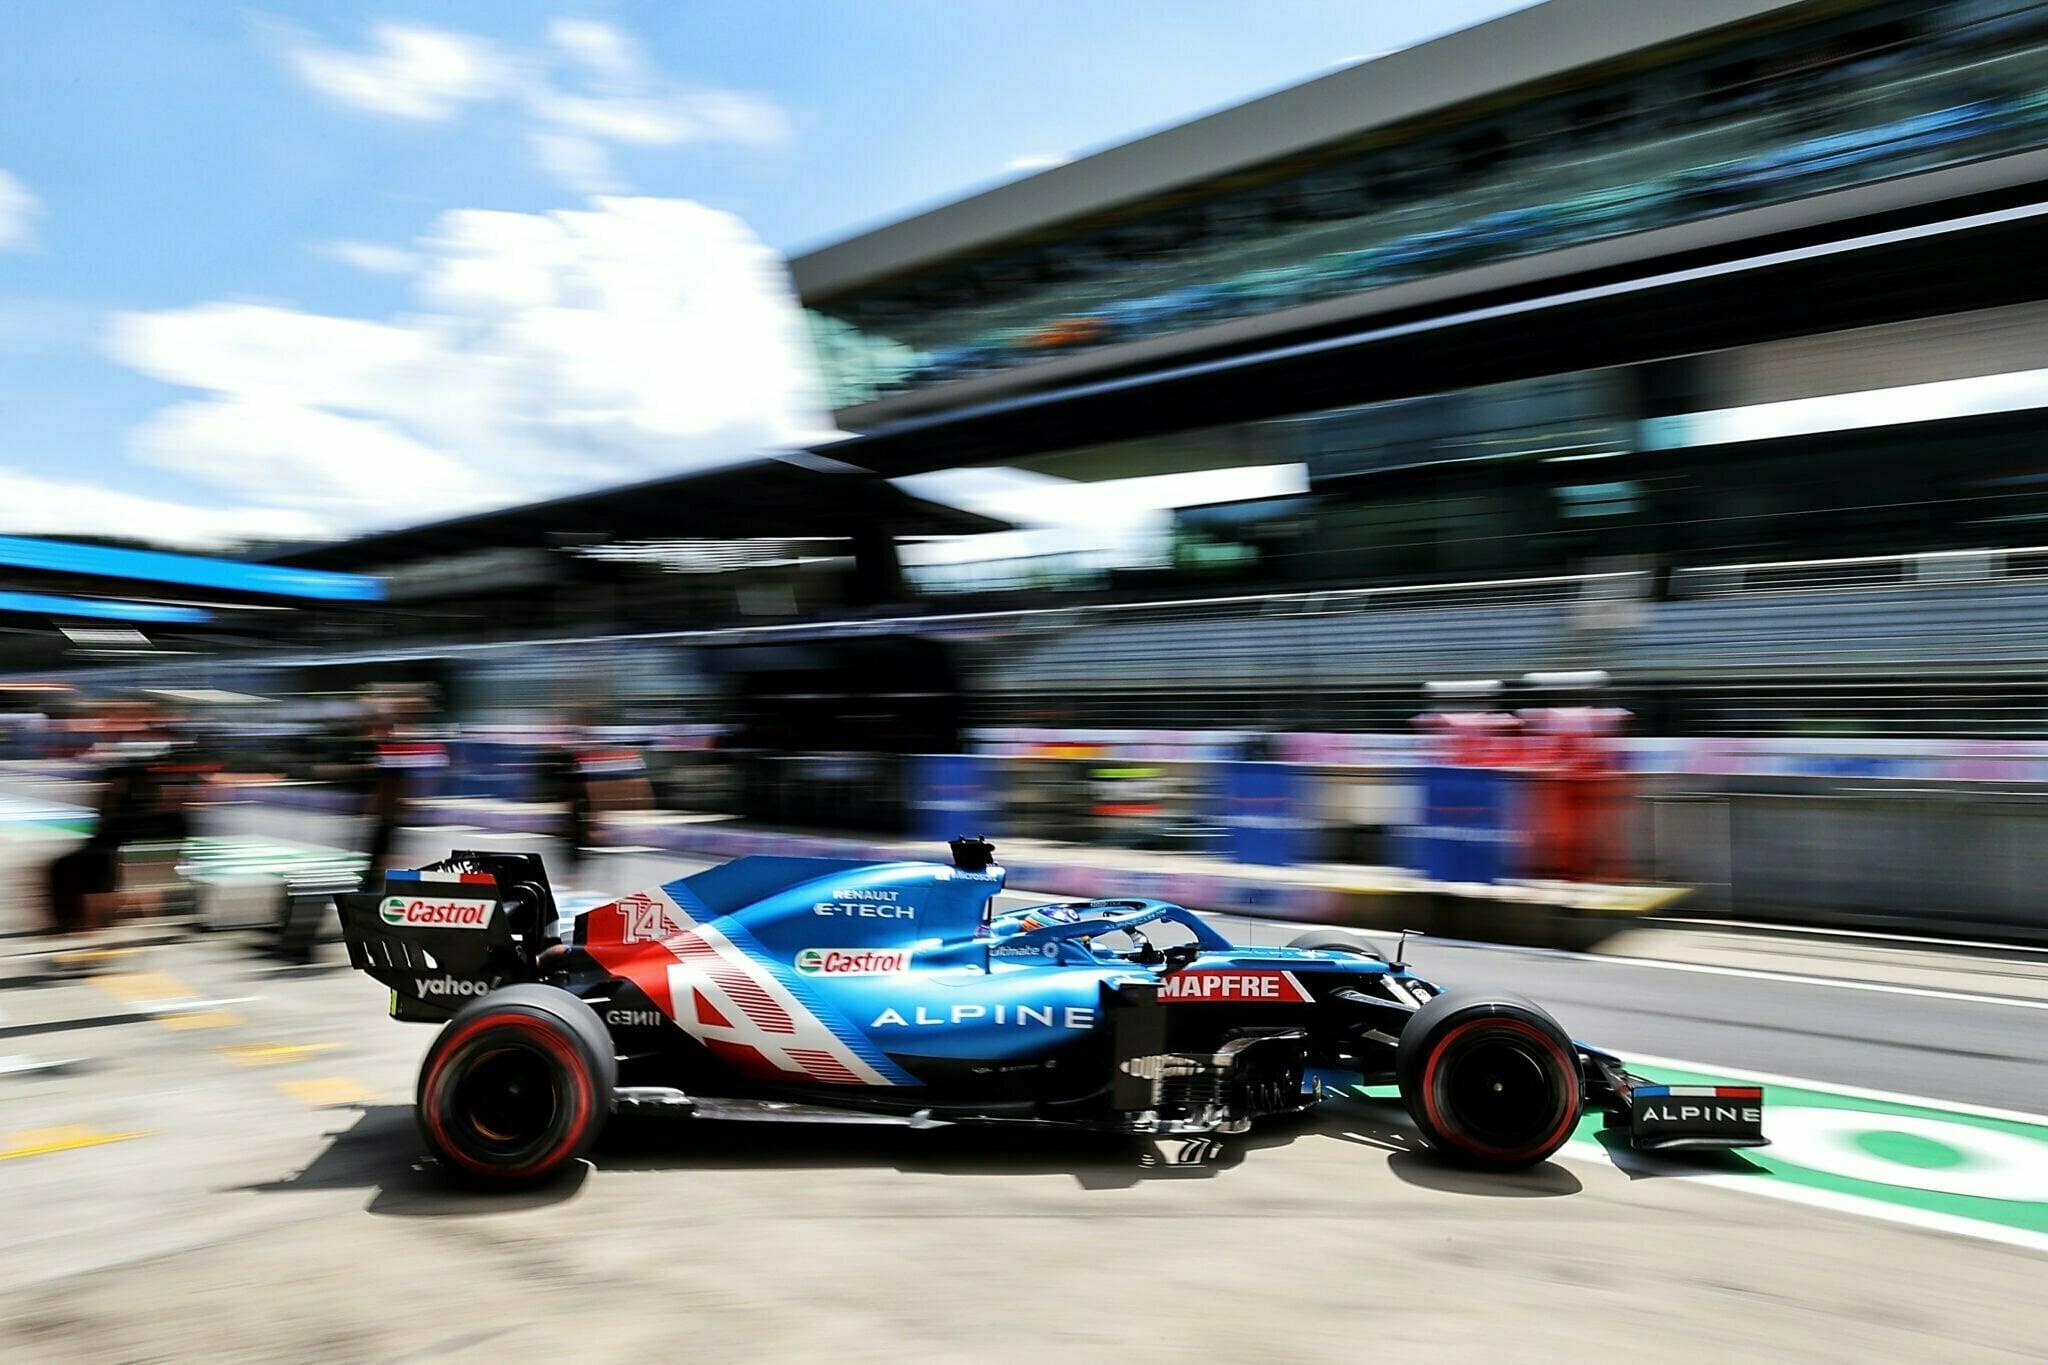 Alpine F1 Team Alonso Ocon Autriche Steiermark Grand Prix Spielberg A521 2021 25 | Alpine F1 : Alonso rapporte deux points au Grand Prix BWT de Styrie